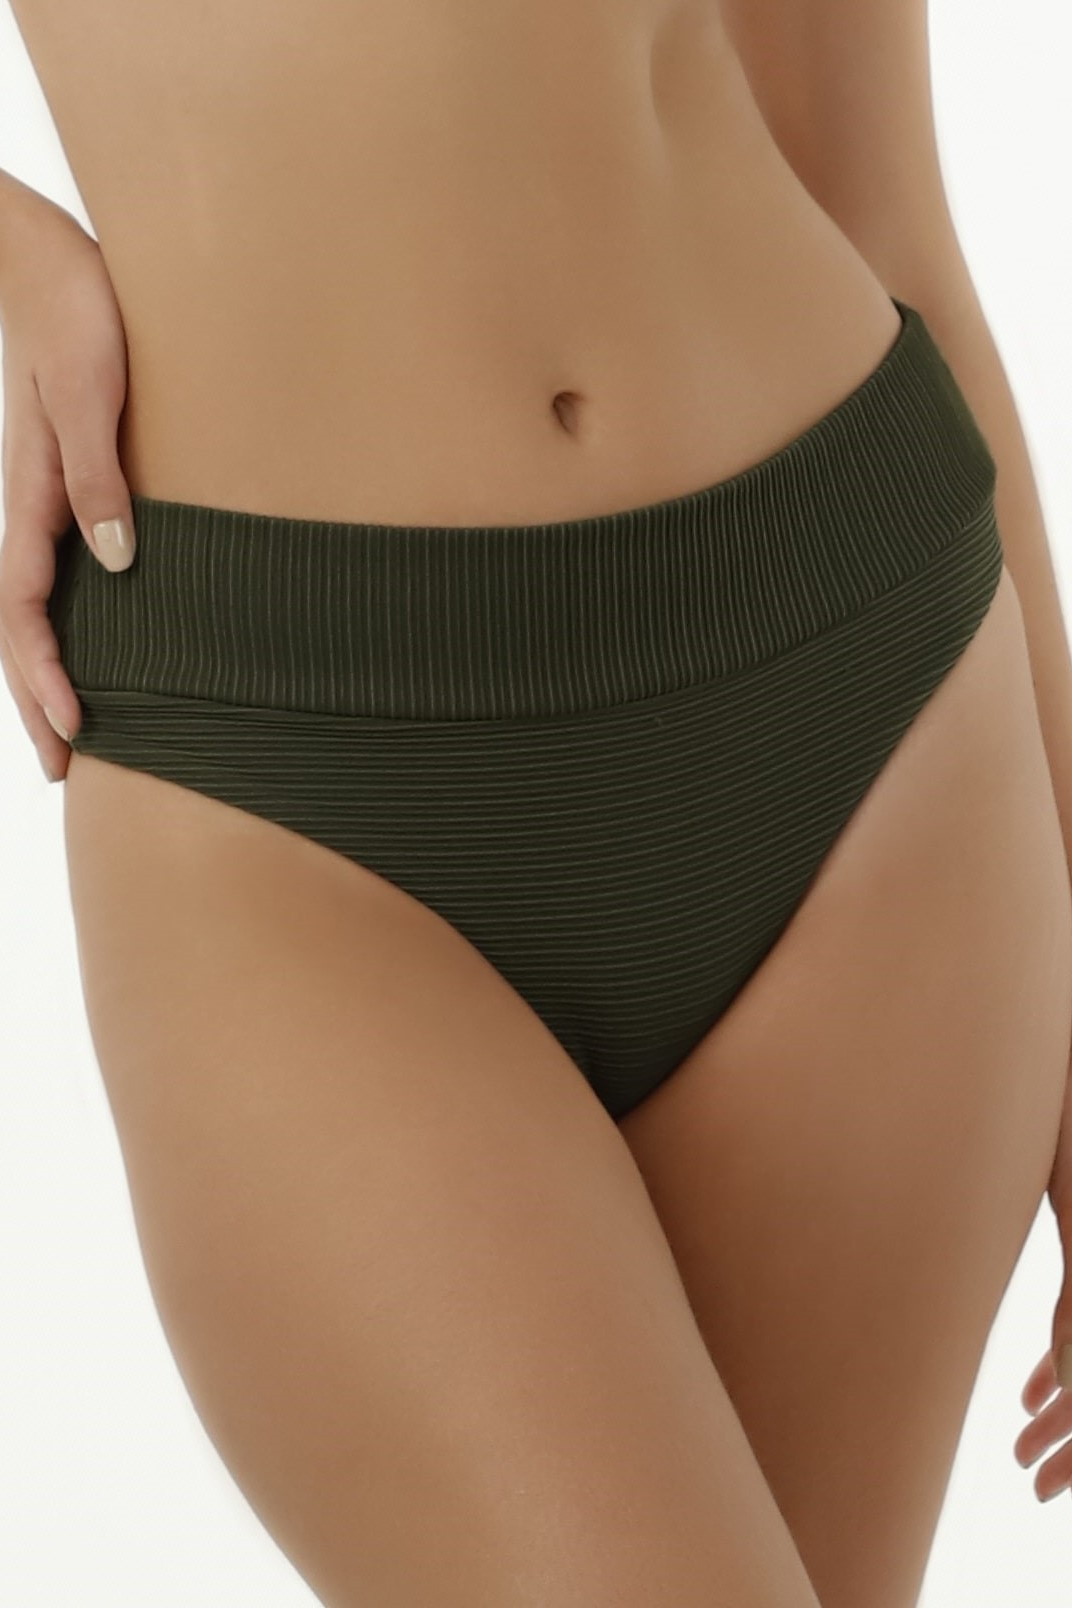 Milonga Texture Bikini High Waisted Bikini Bottom Green